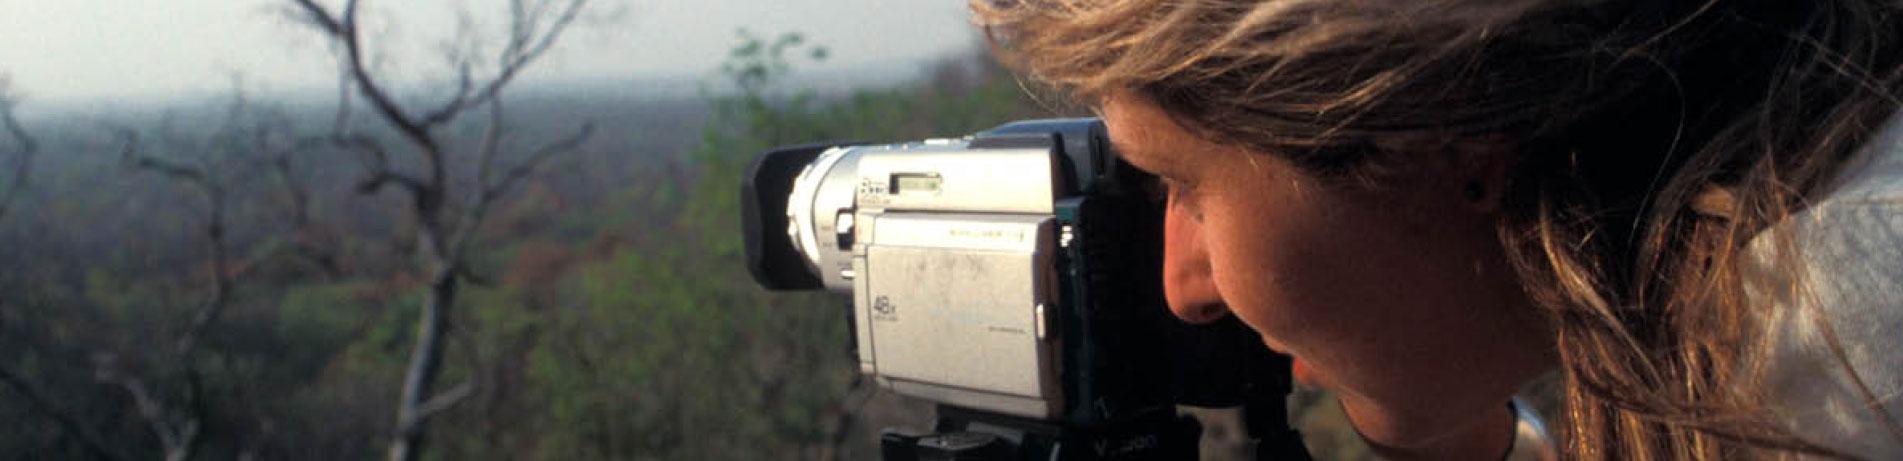 Debbie banks using a video camera, India